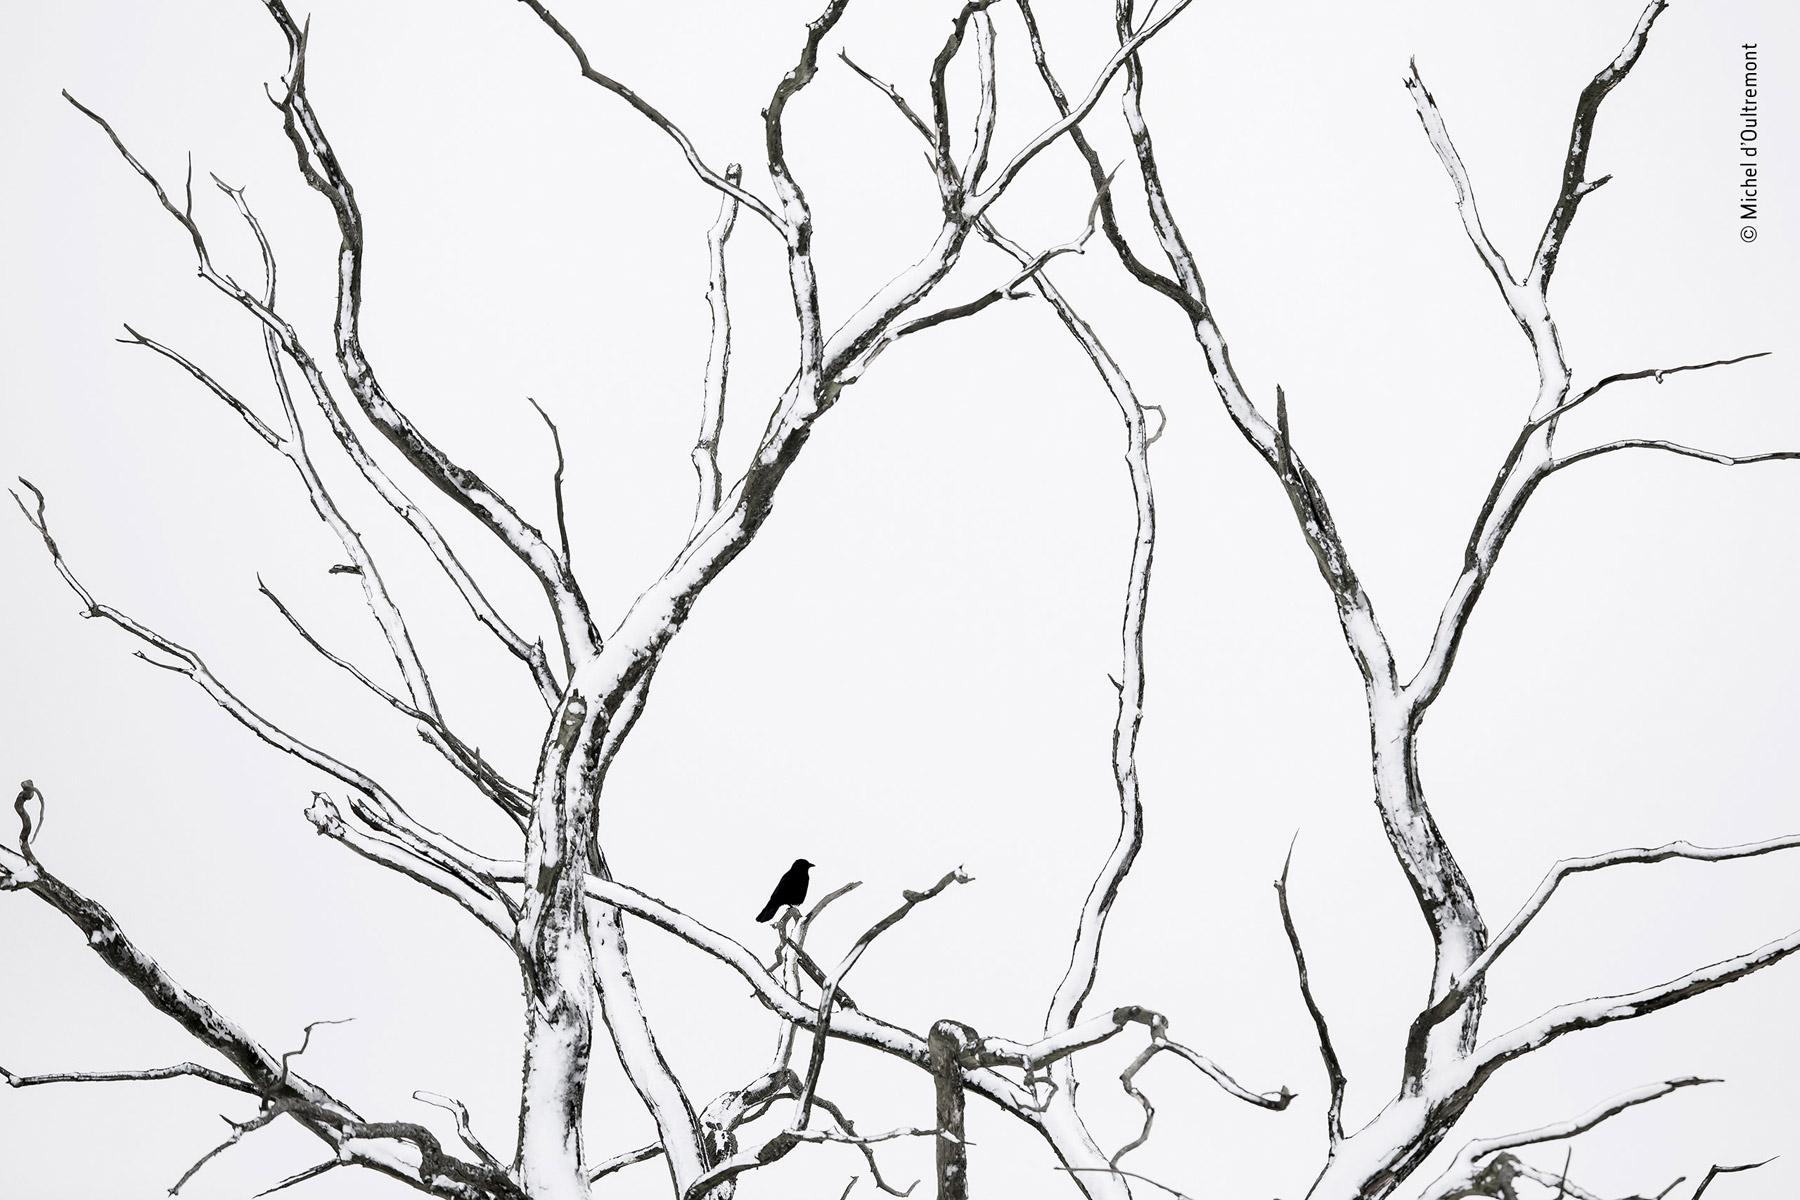 Lines, © Michel Doultremont, Third Place, Golden Turtle Photo Contest